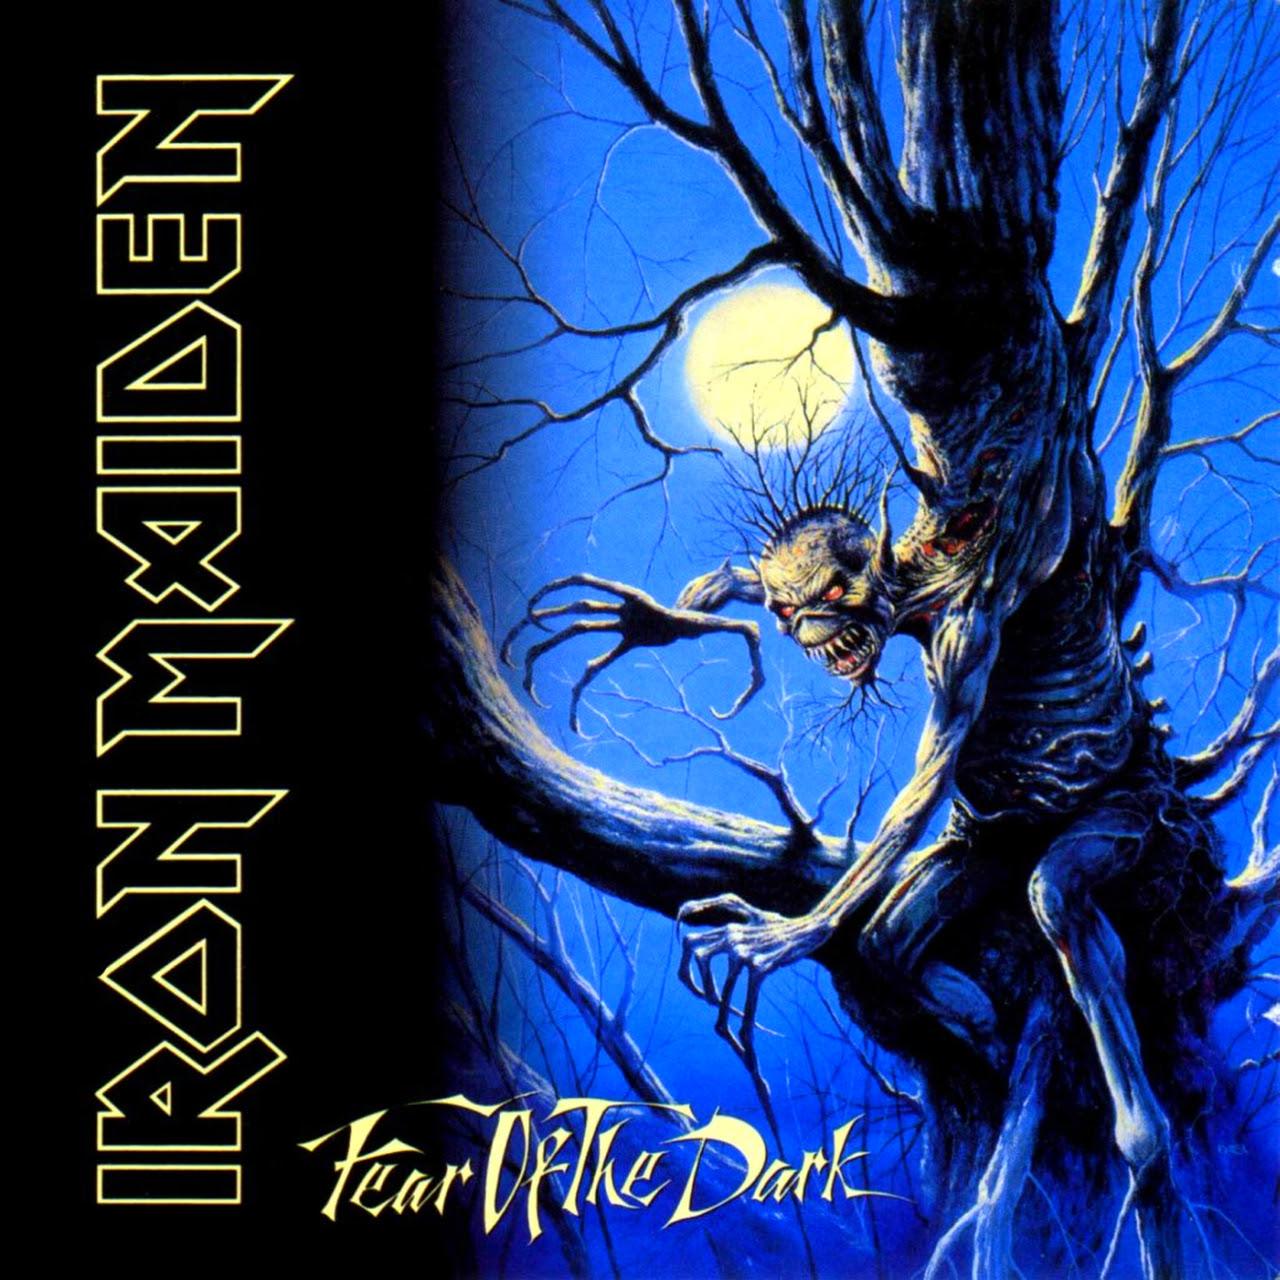 Fear Of The Dark Iron Maiden Photo 38438739 Fanpop